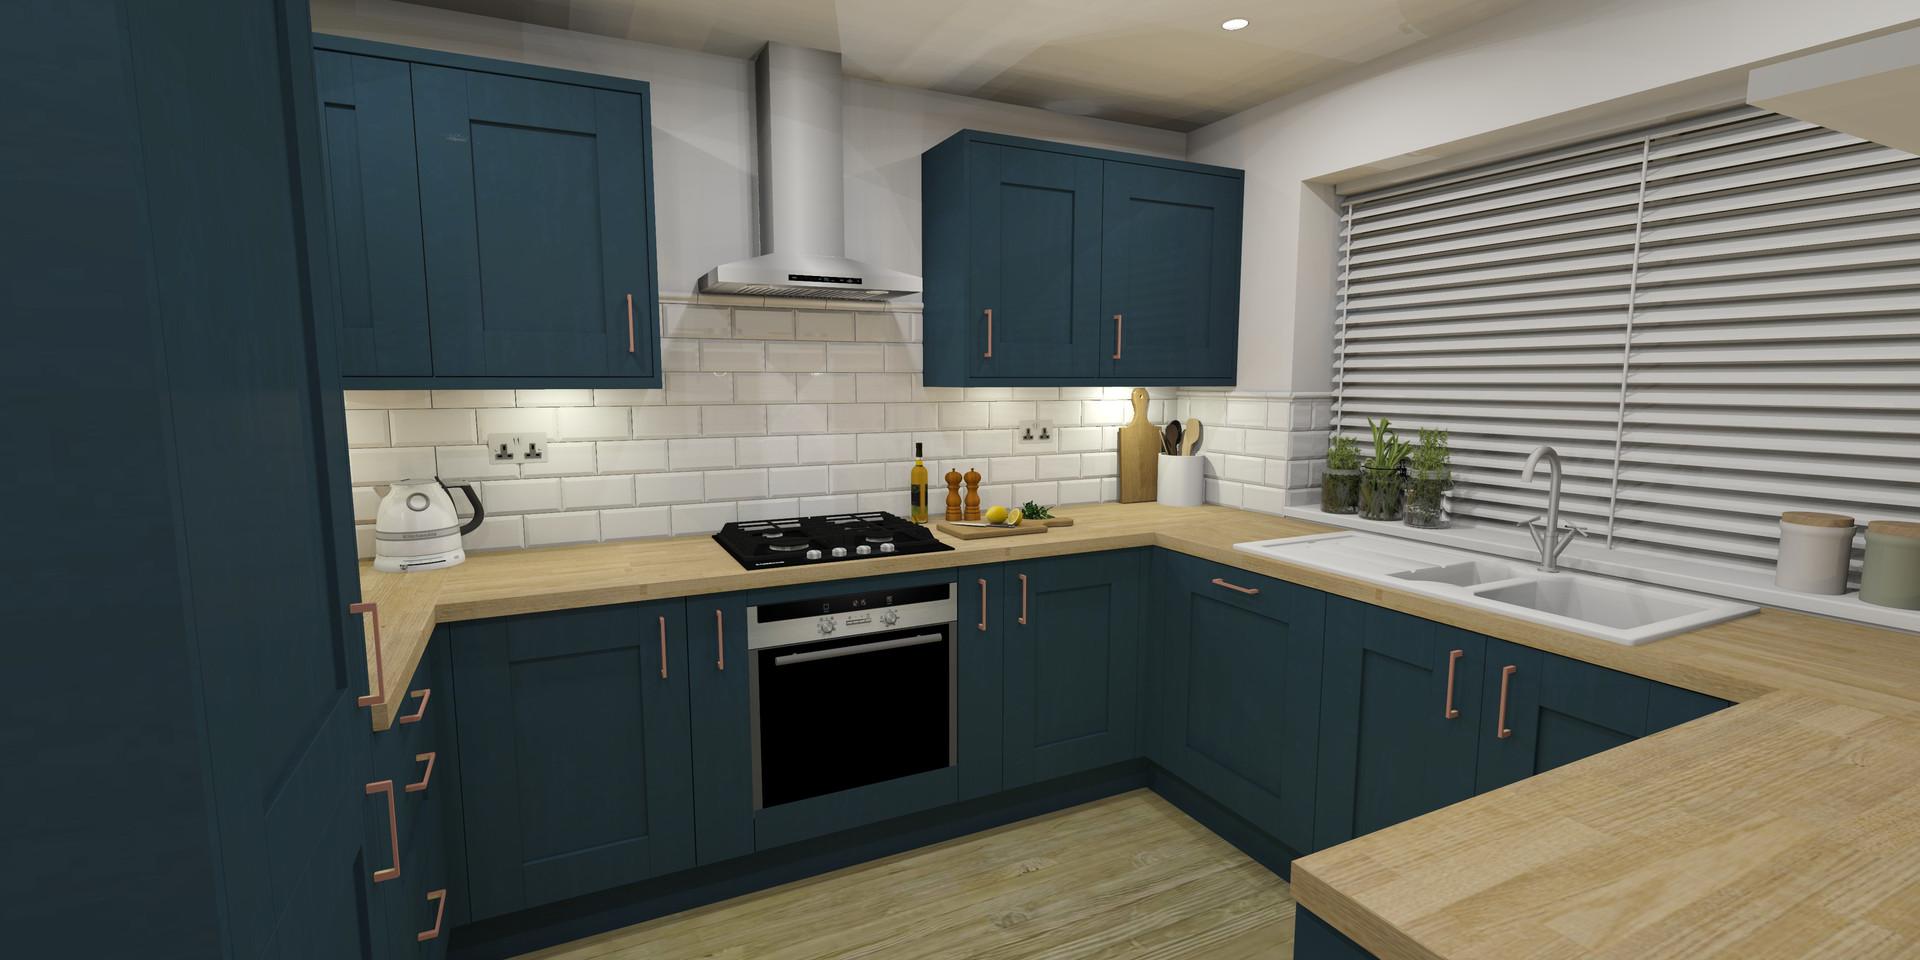 Broadclyst Kitchen Design Image A